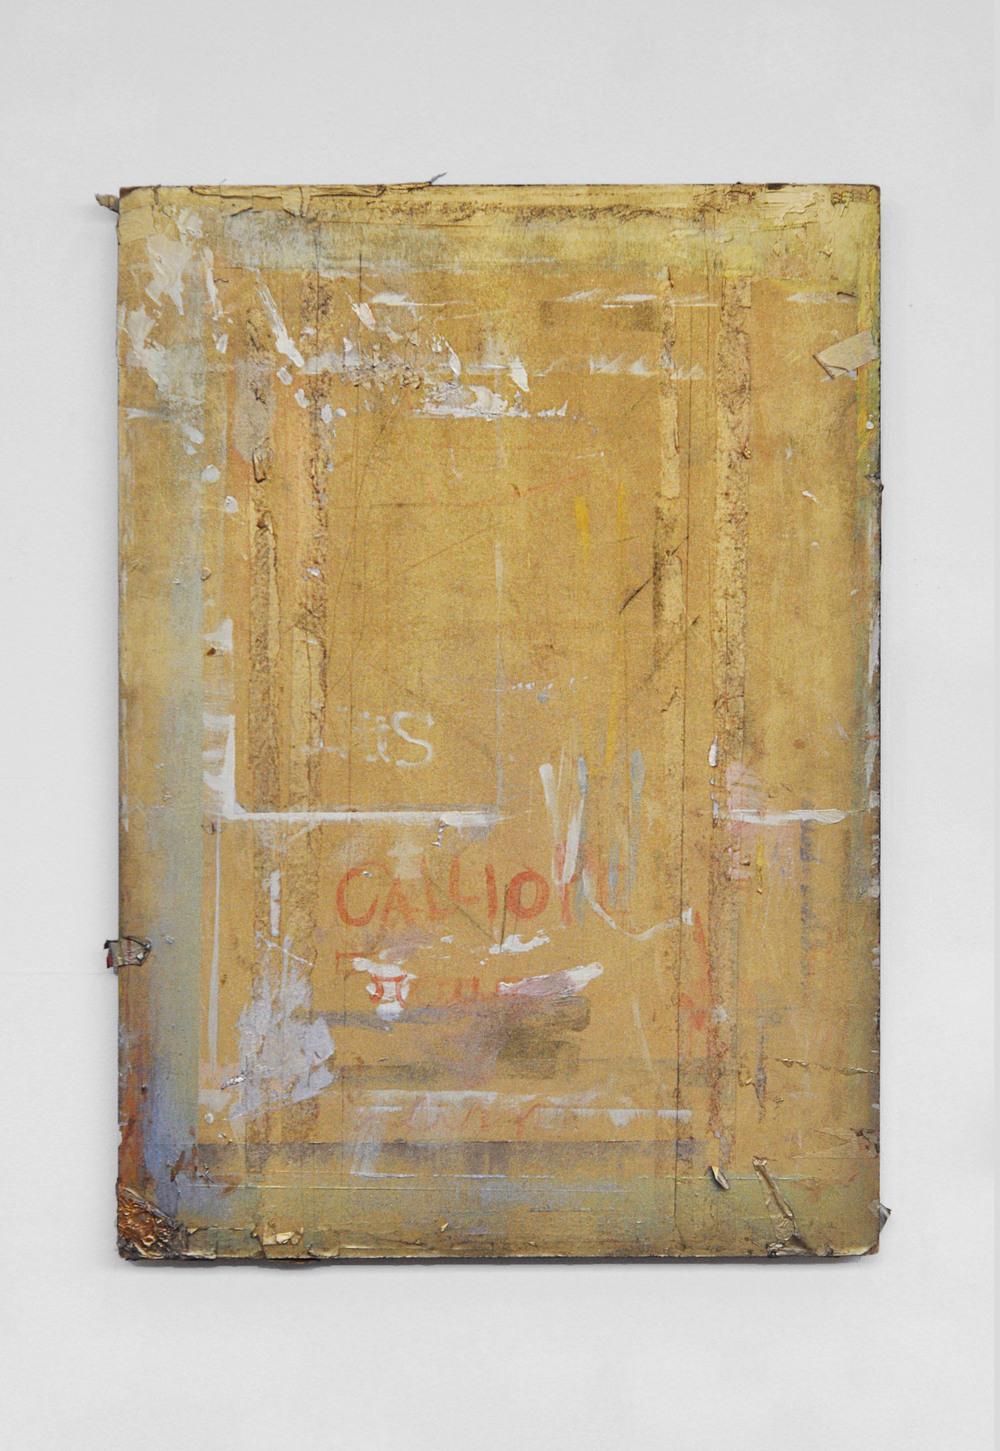 Untitled  Spray paint on wood, 2015 (79x56cm)